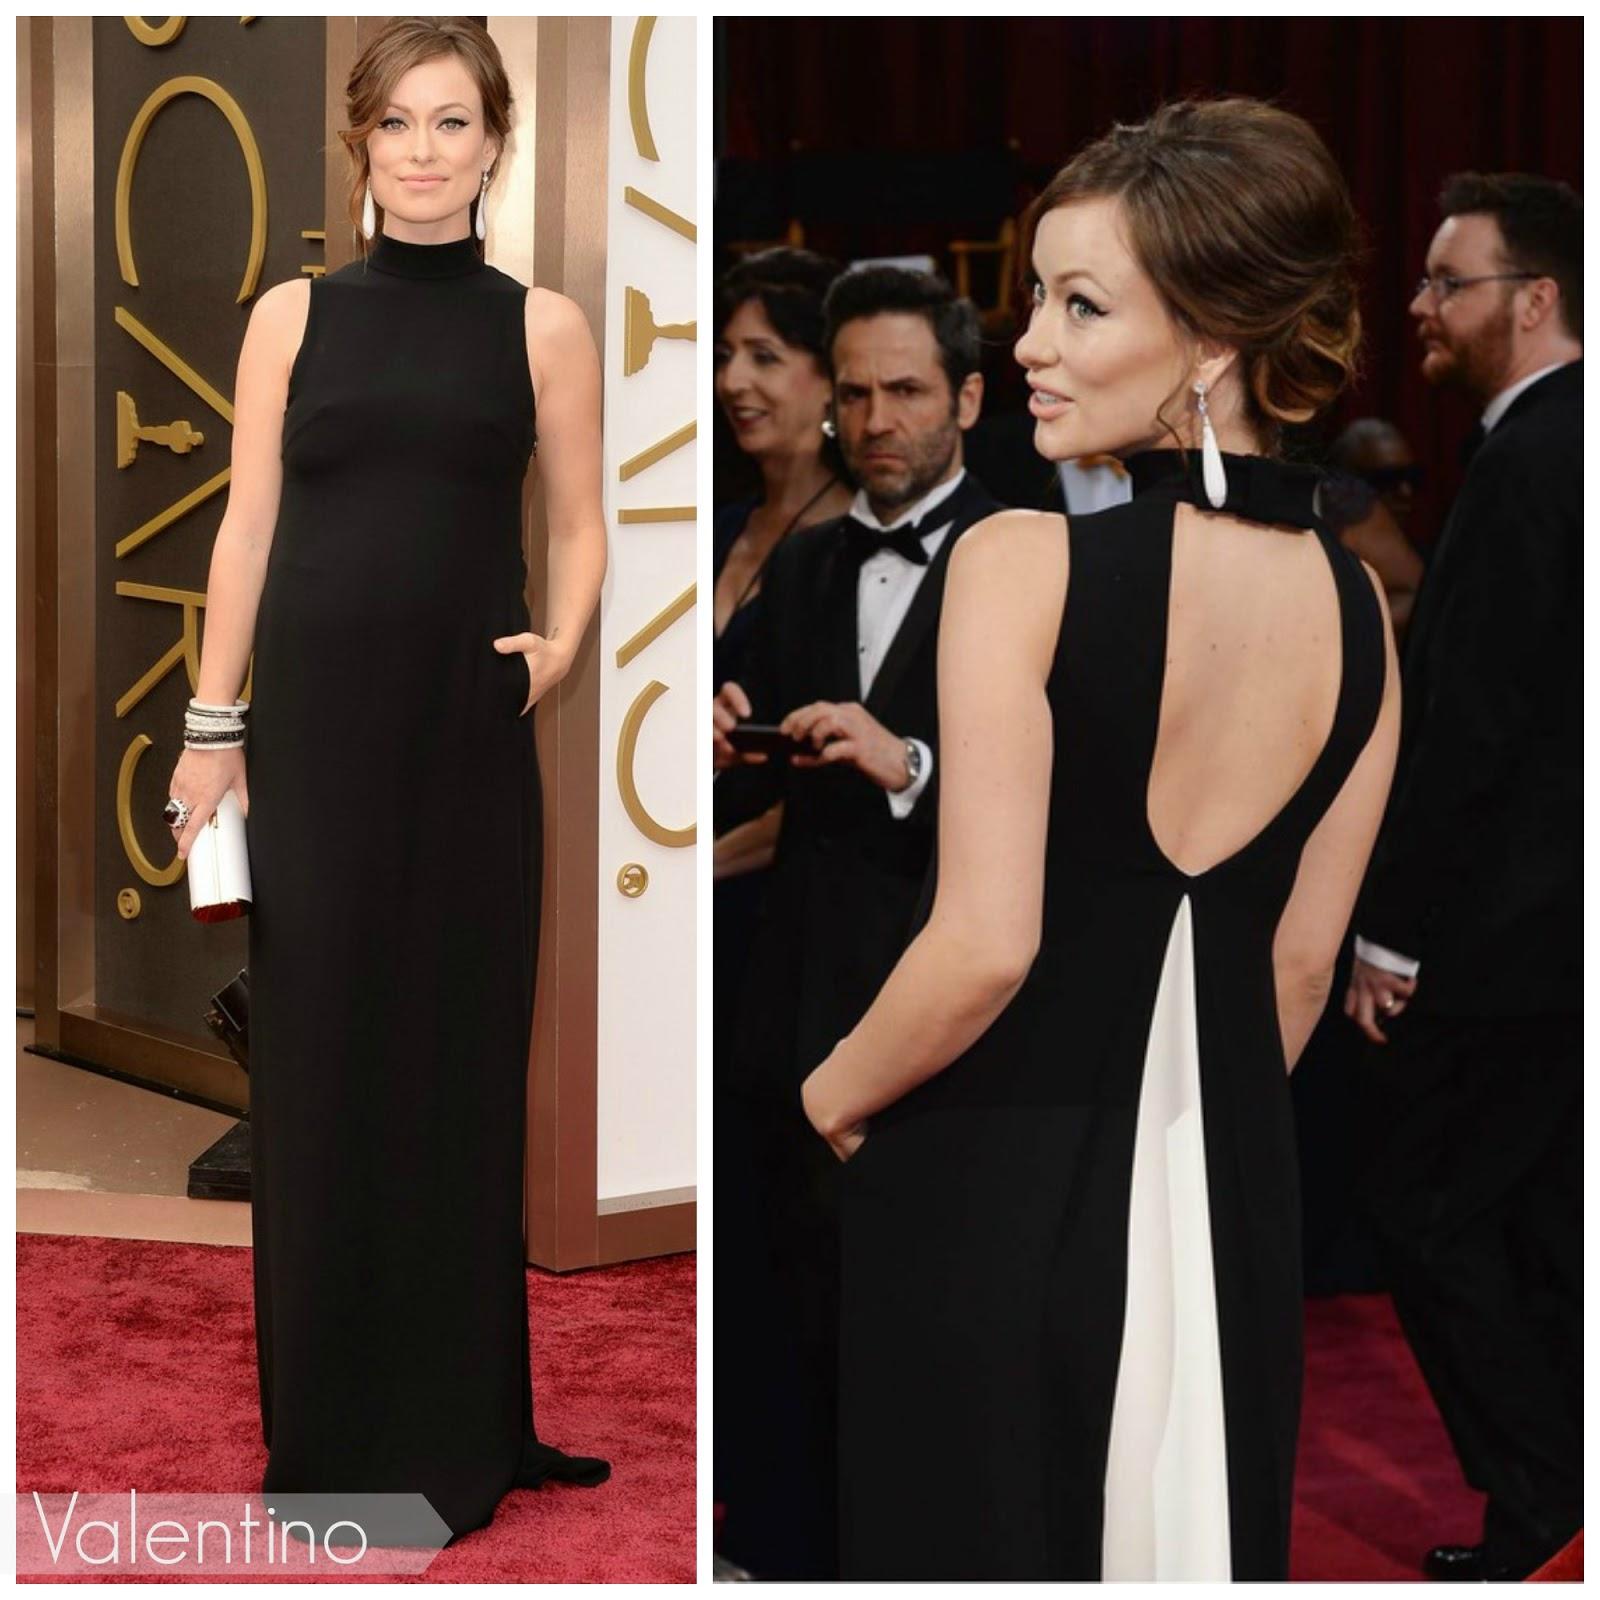 Olivia Wilde Premios óscar 2014